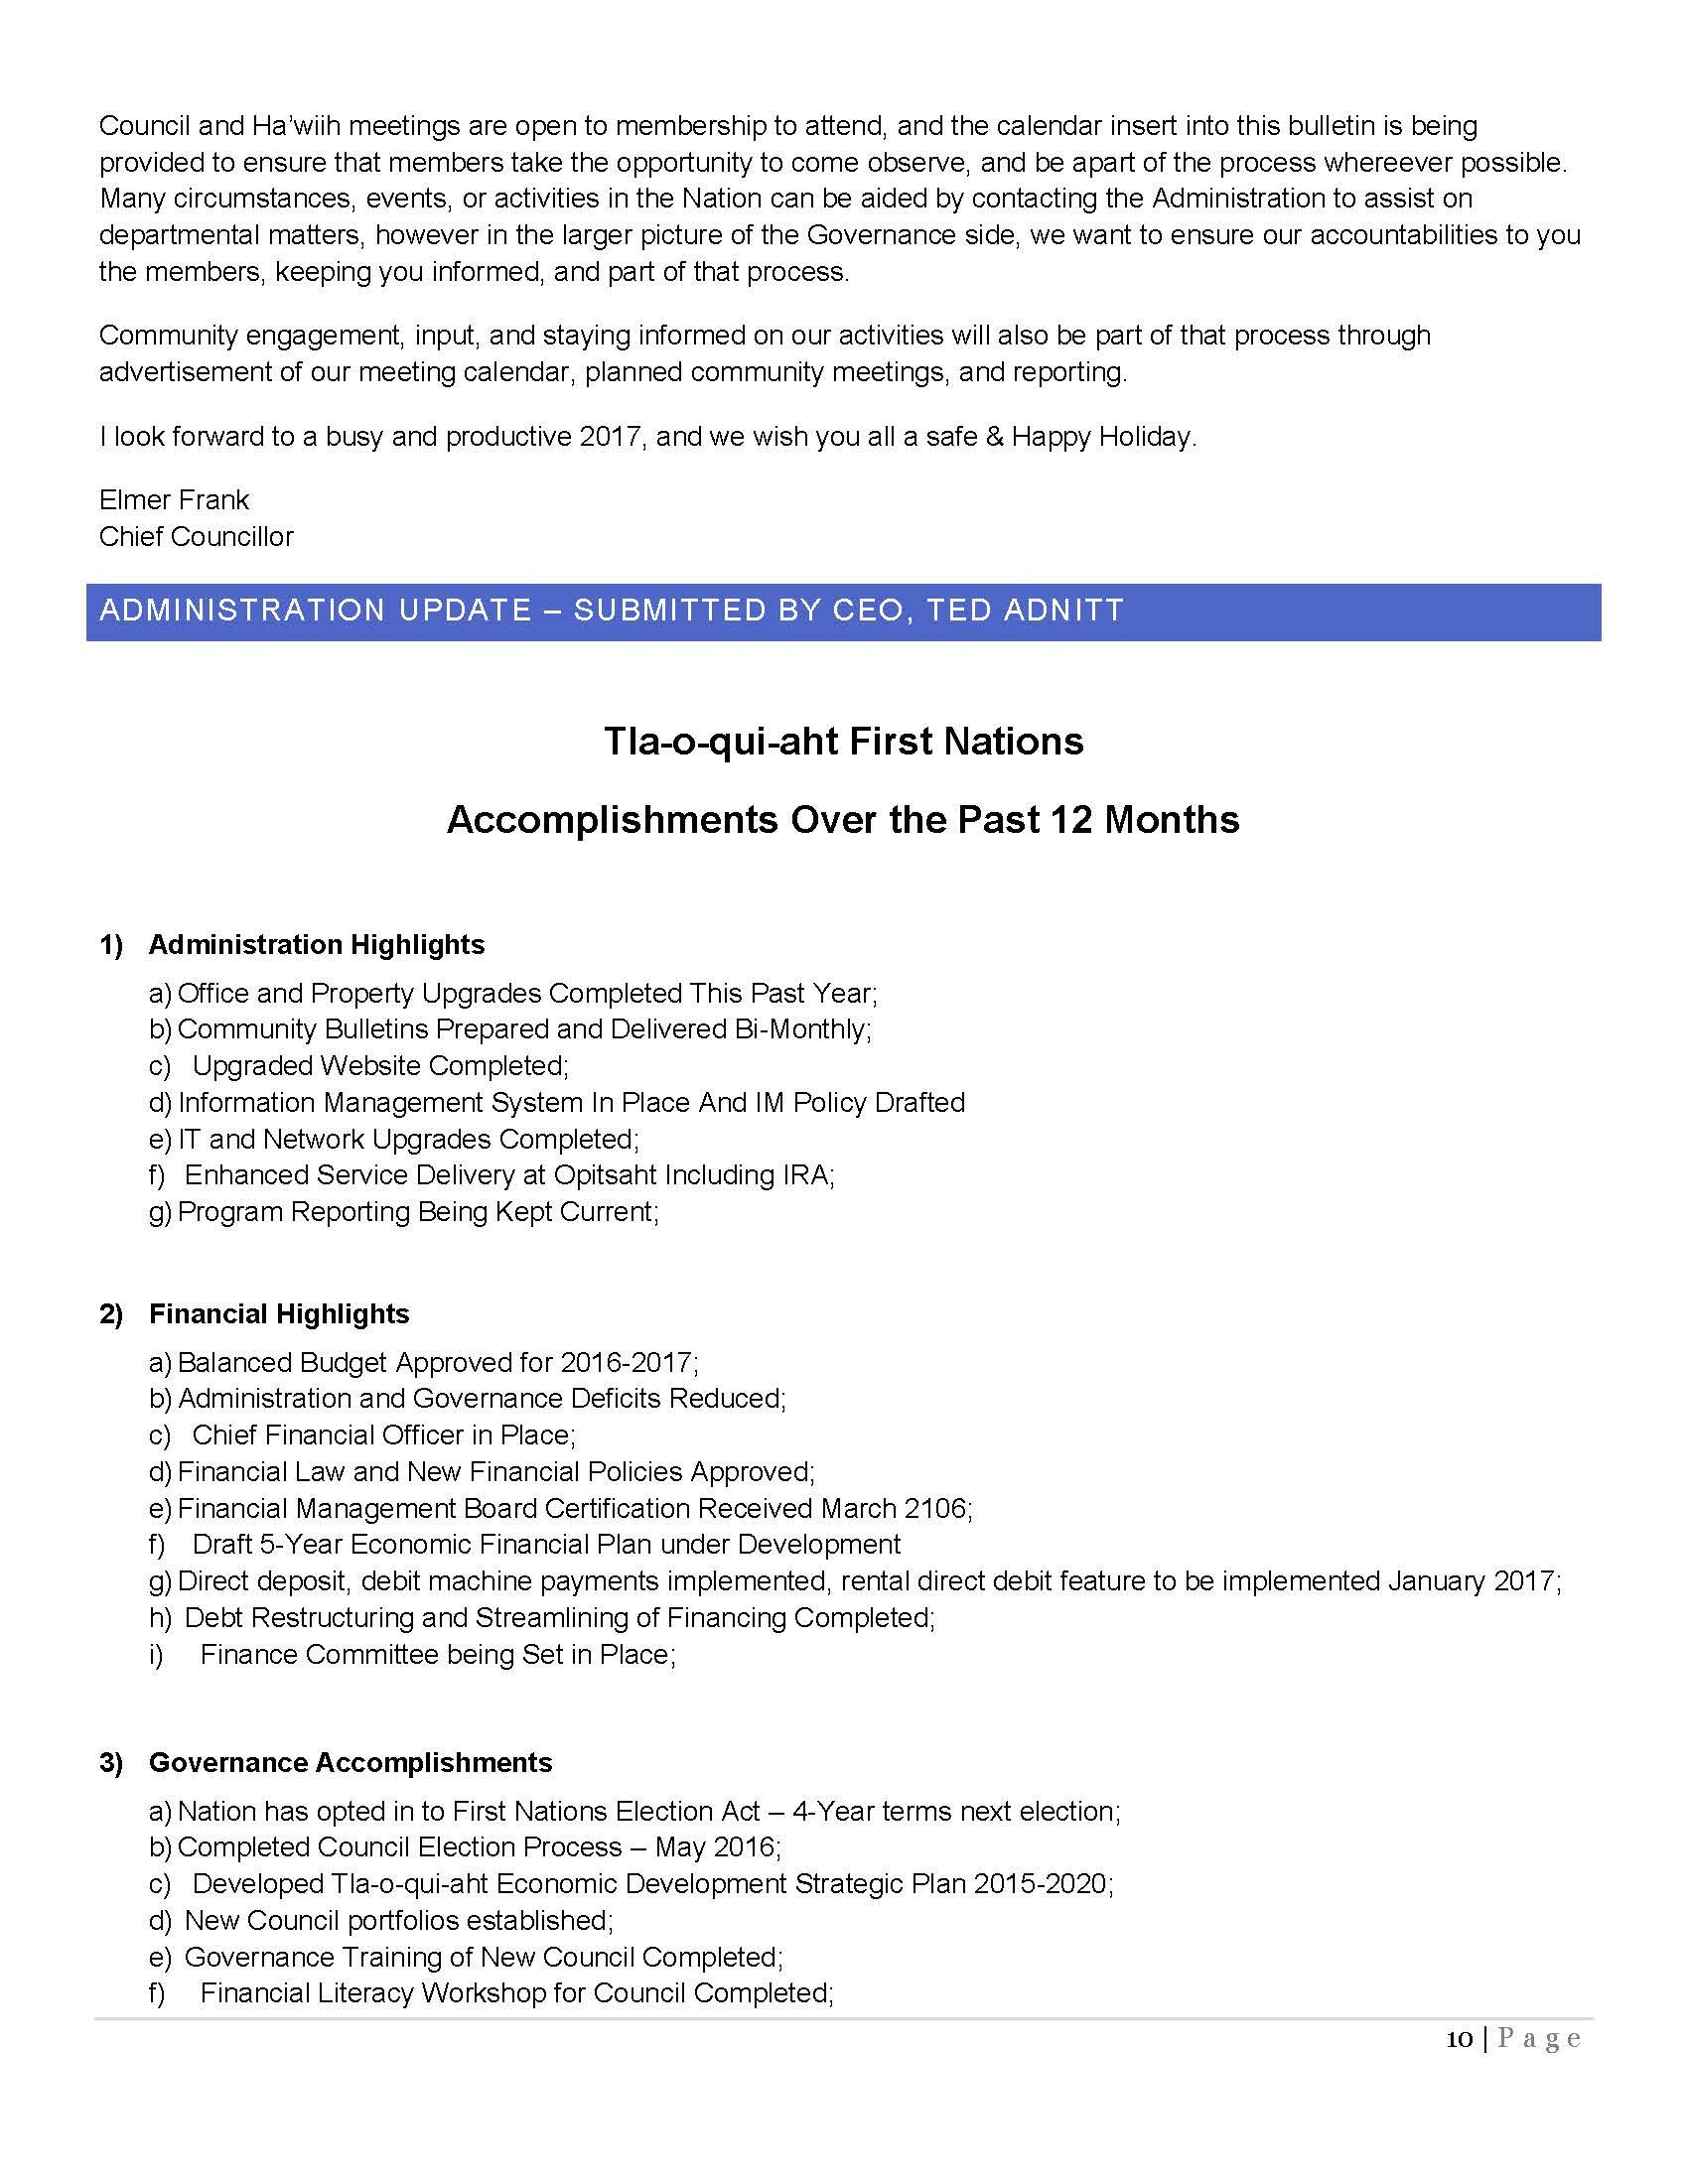 TFN Bulletin Dec 15-2016 - WEBSITE VERSION_Page_10.jpg